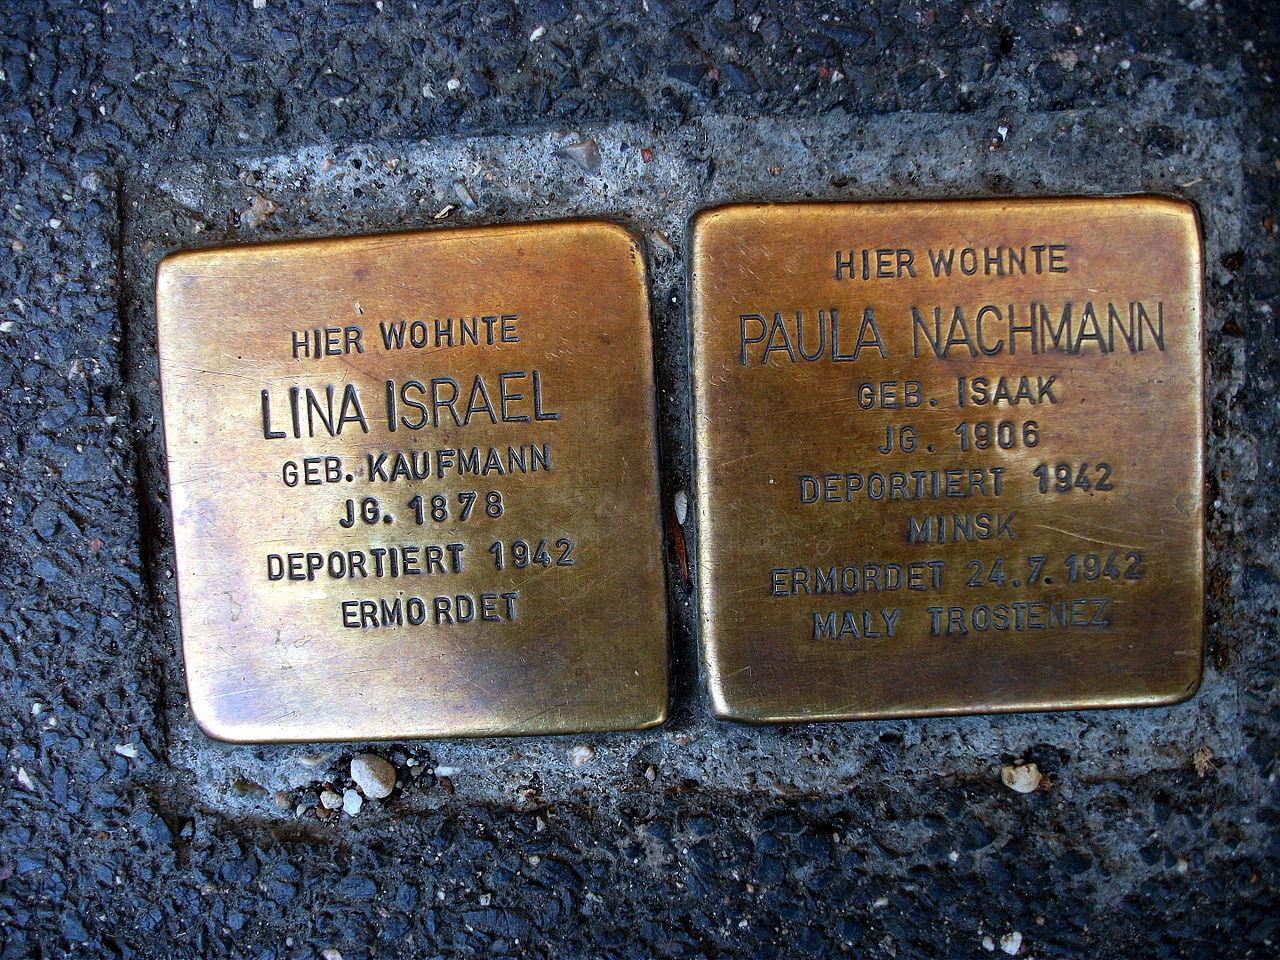 Stolpersteins Lina Israel Paula Nachmann Friesdorfer Straße 92 Bonn.JPG